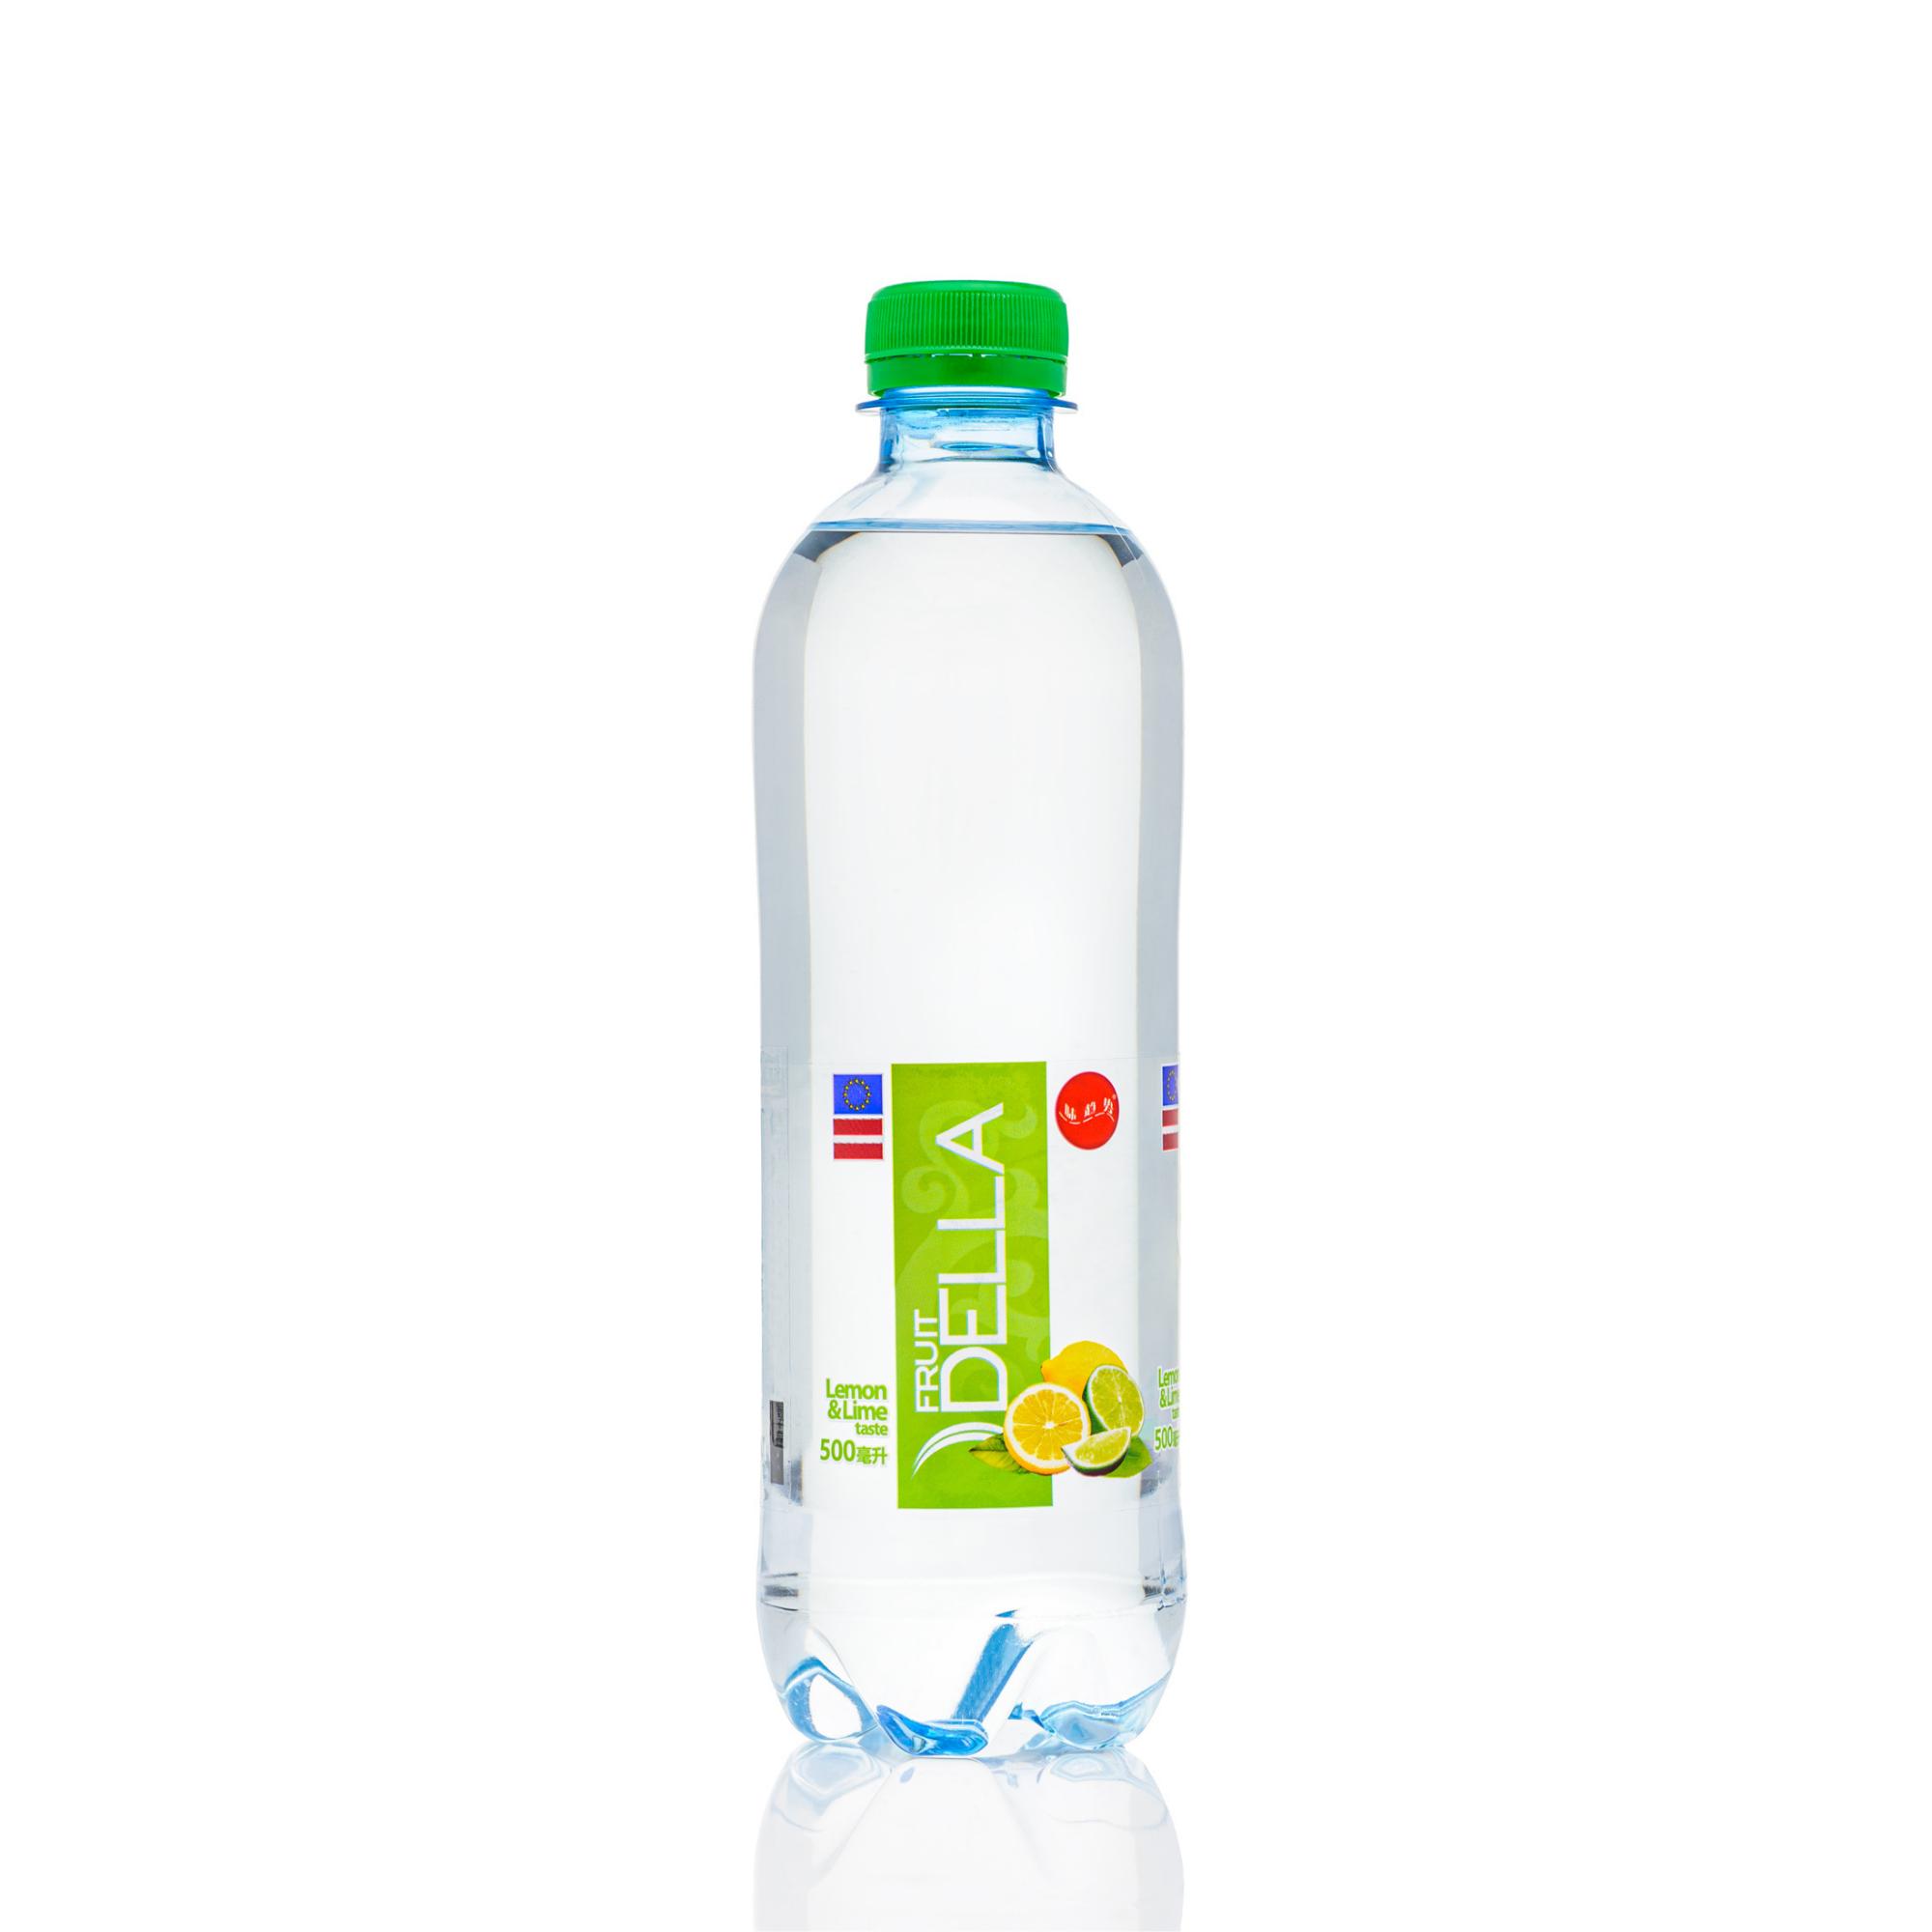 Soft drink DELLA LEMON&LIME 500ML STILL SPARKLING